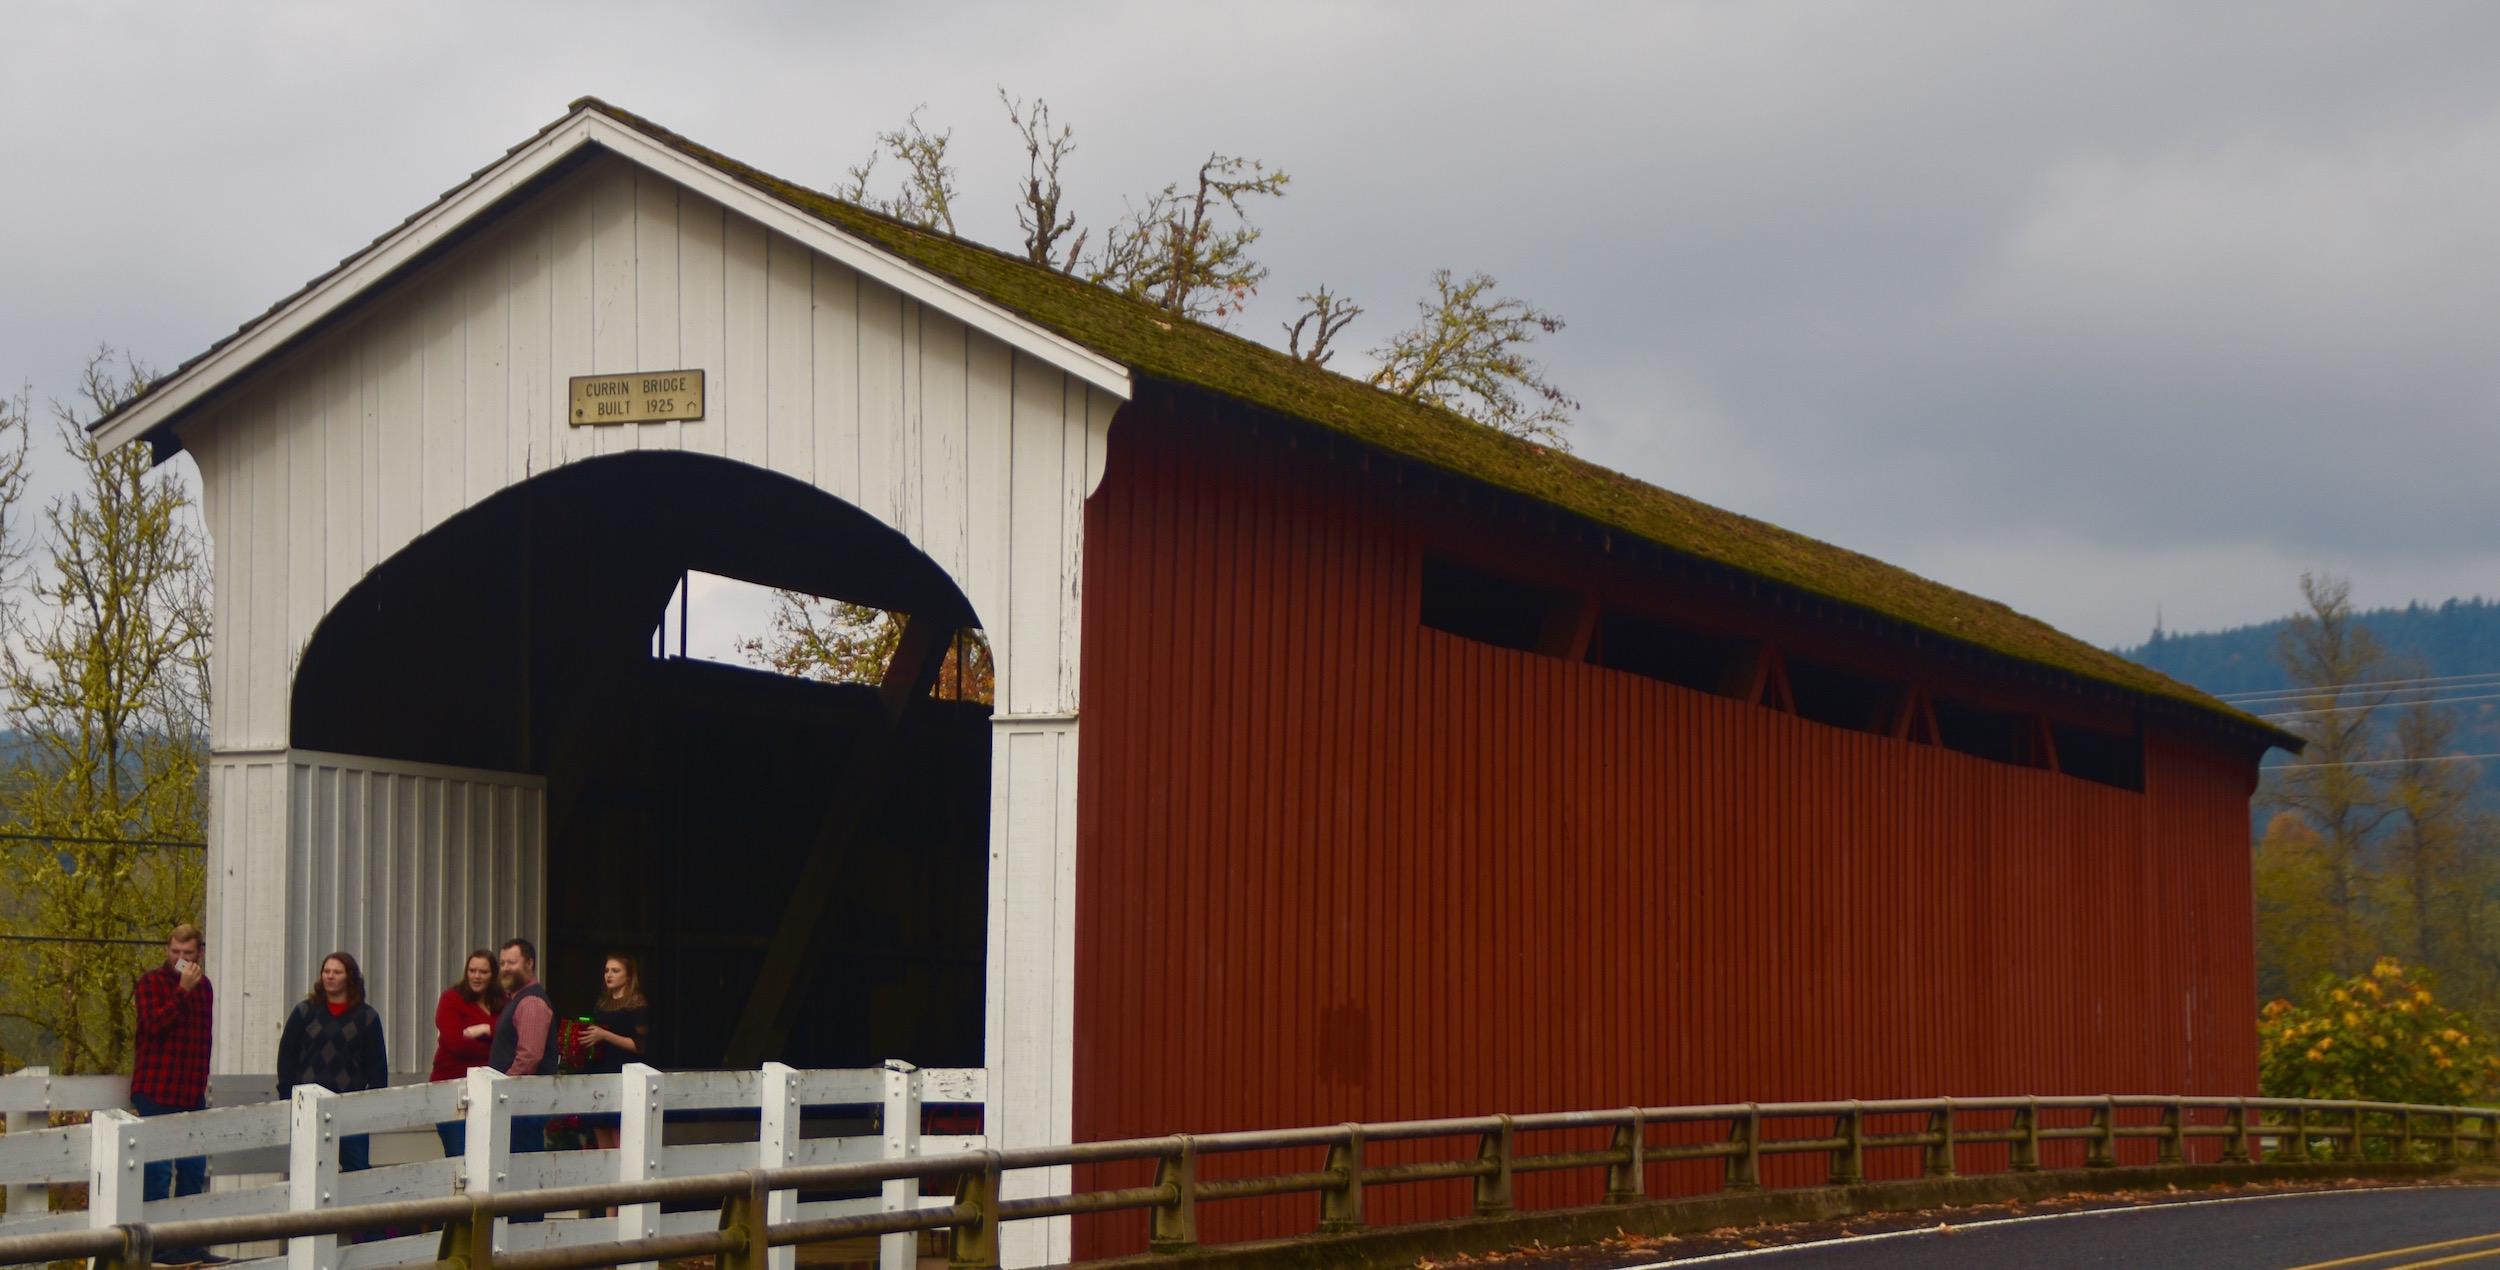 Currin Bridge, Lane County